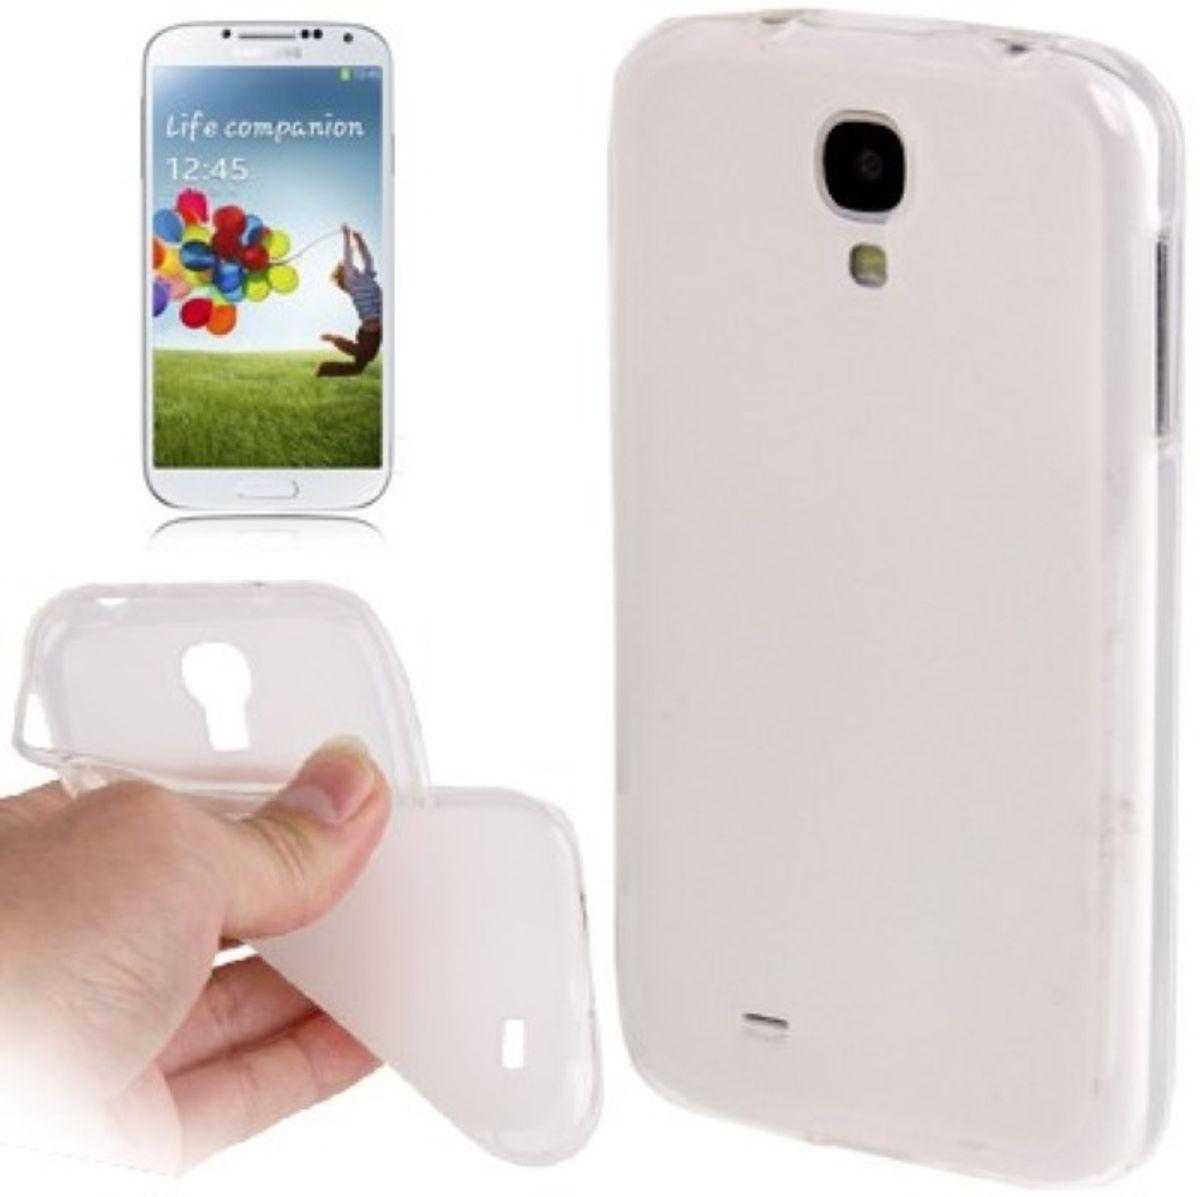 Schutzhülle TPU Case für Handy Samsung Galaxy S4 GT-I9500 / GT-I9505 / LTE+ GT-I9506 / Value Edition GT-I9515